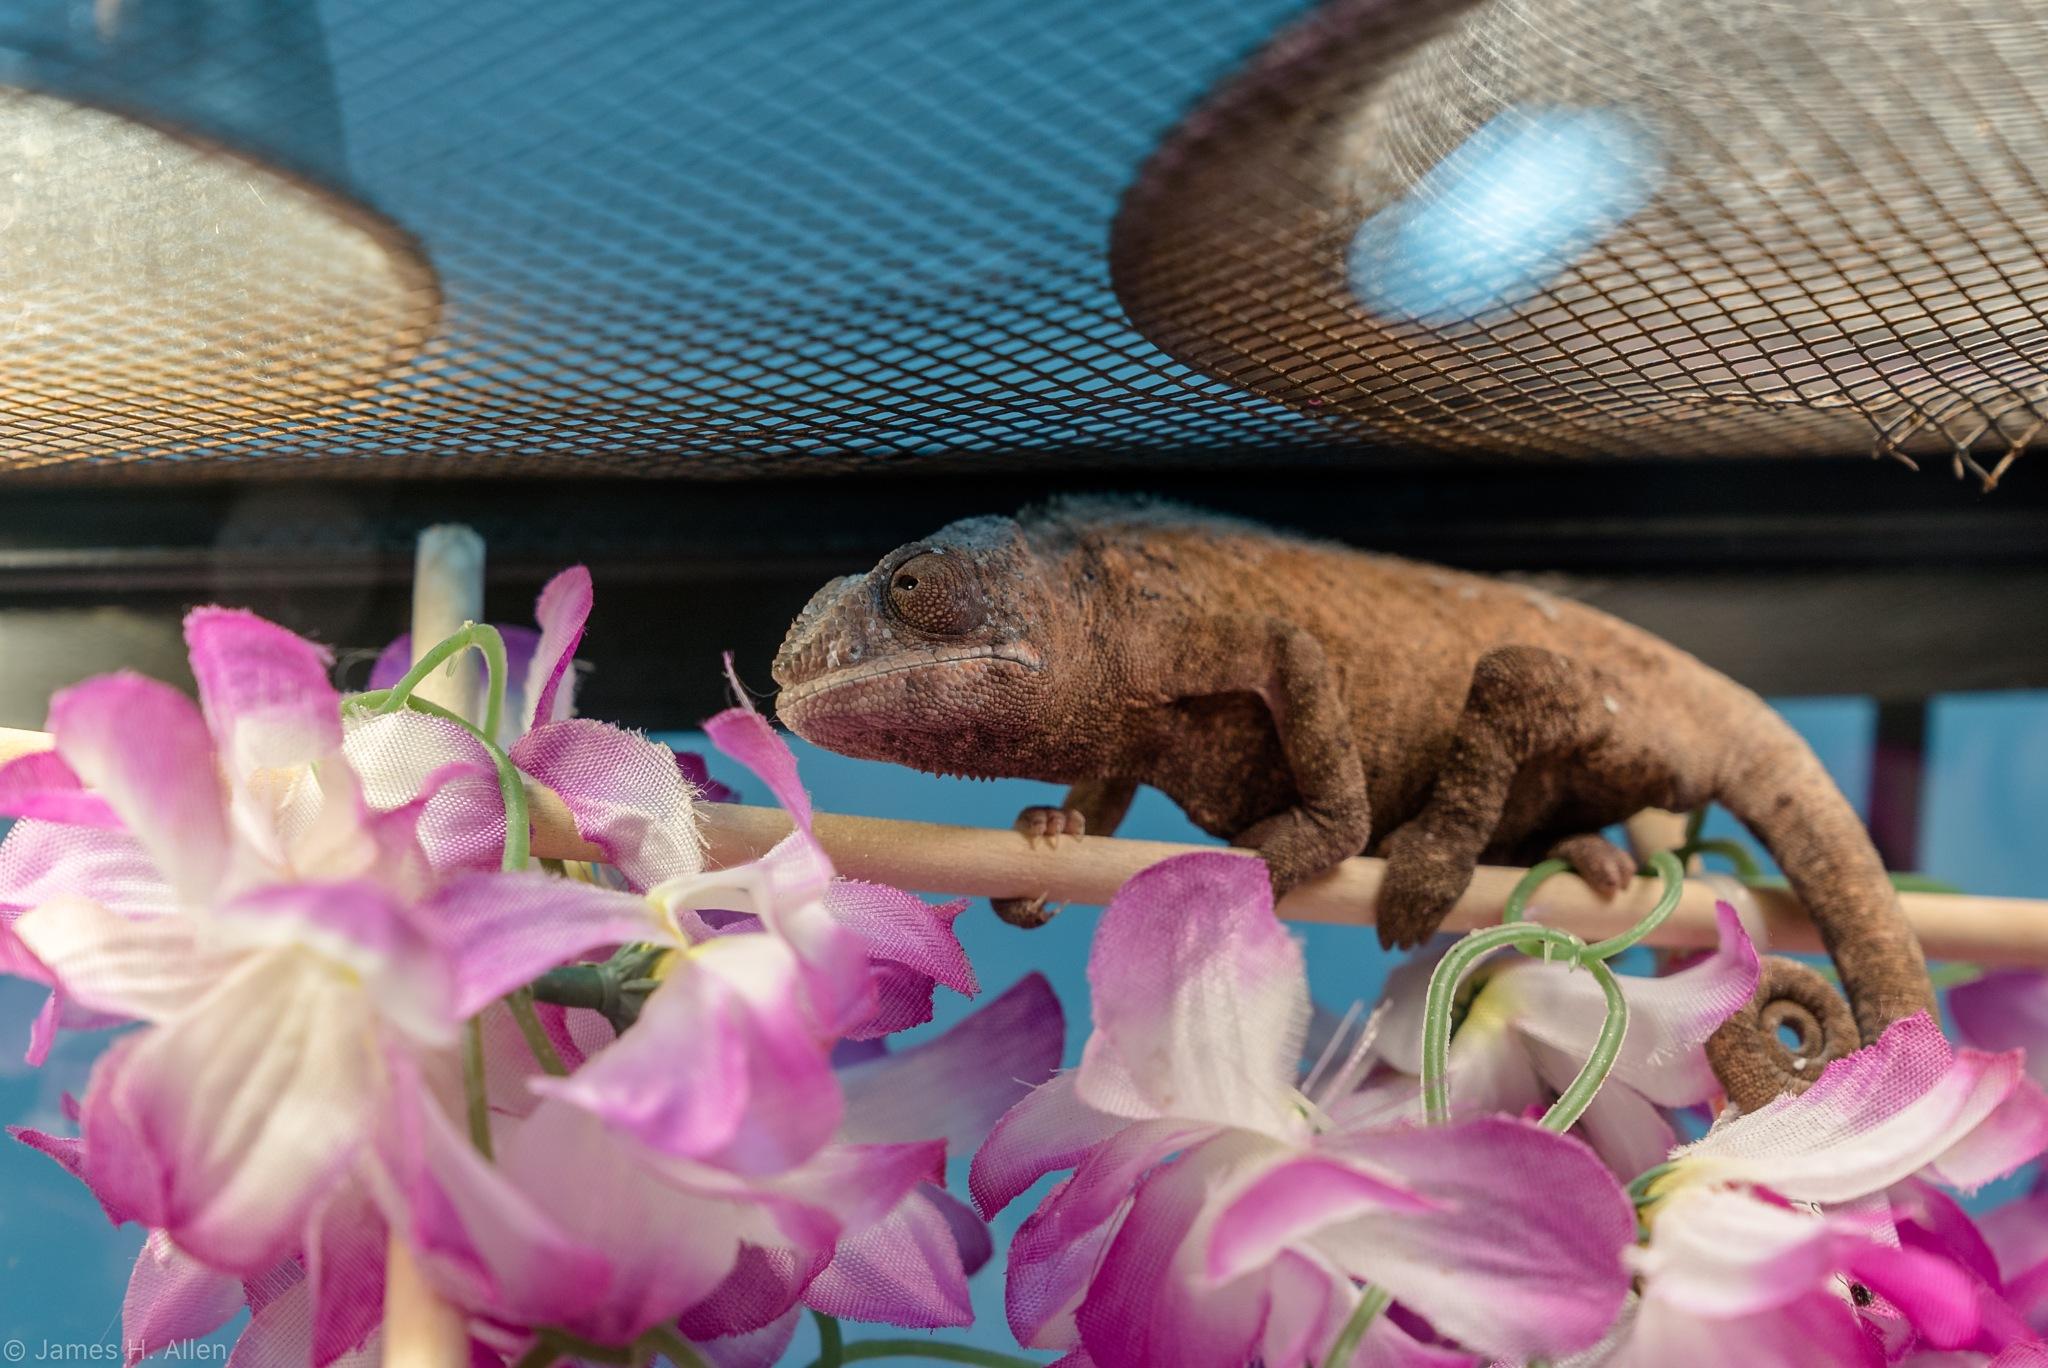 Lizard by jhallen59